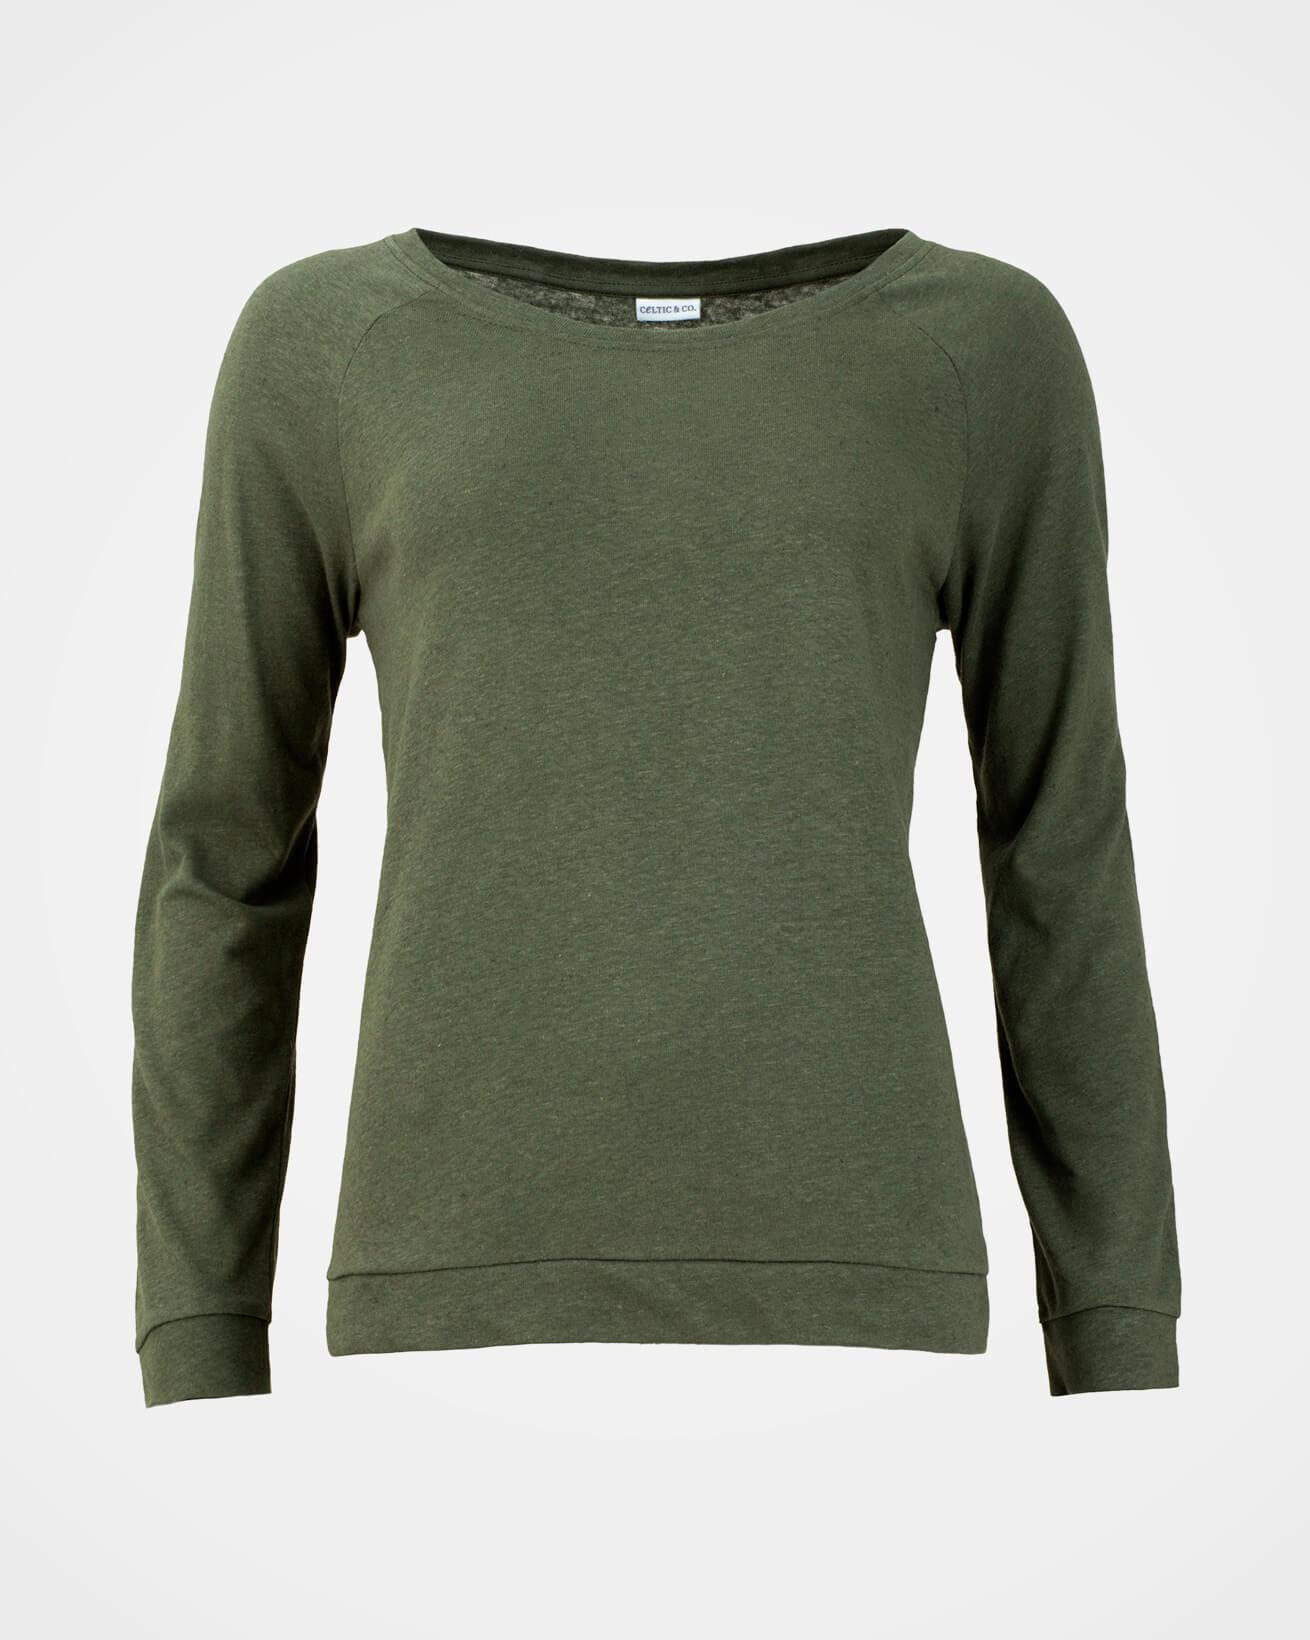 7584_linen-cotton-sweatshirt_olive_front_web.jpg